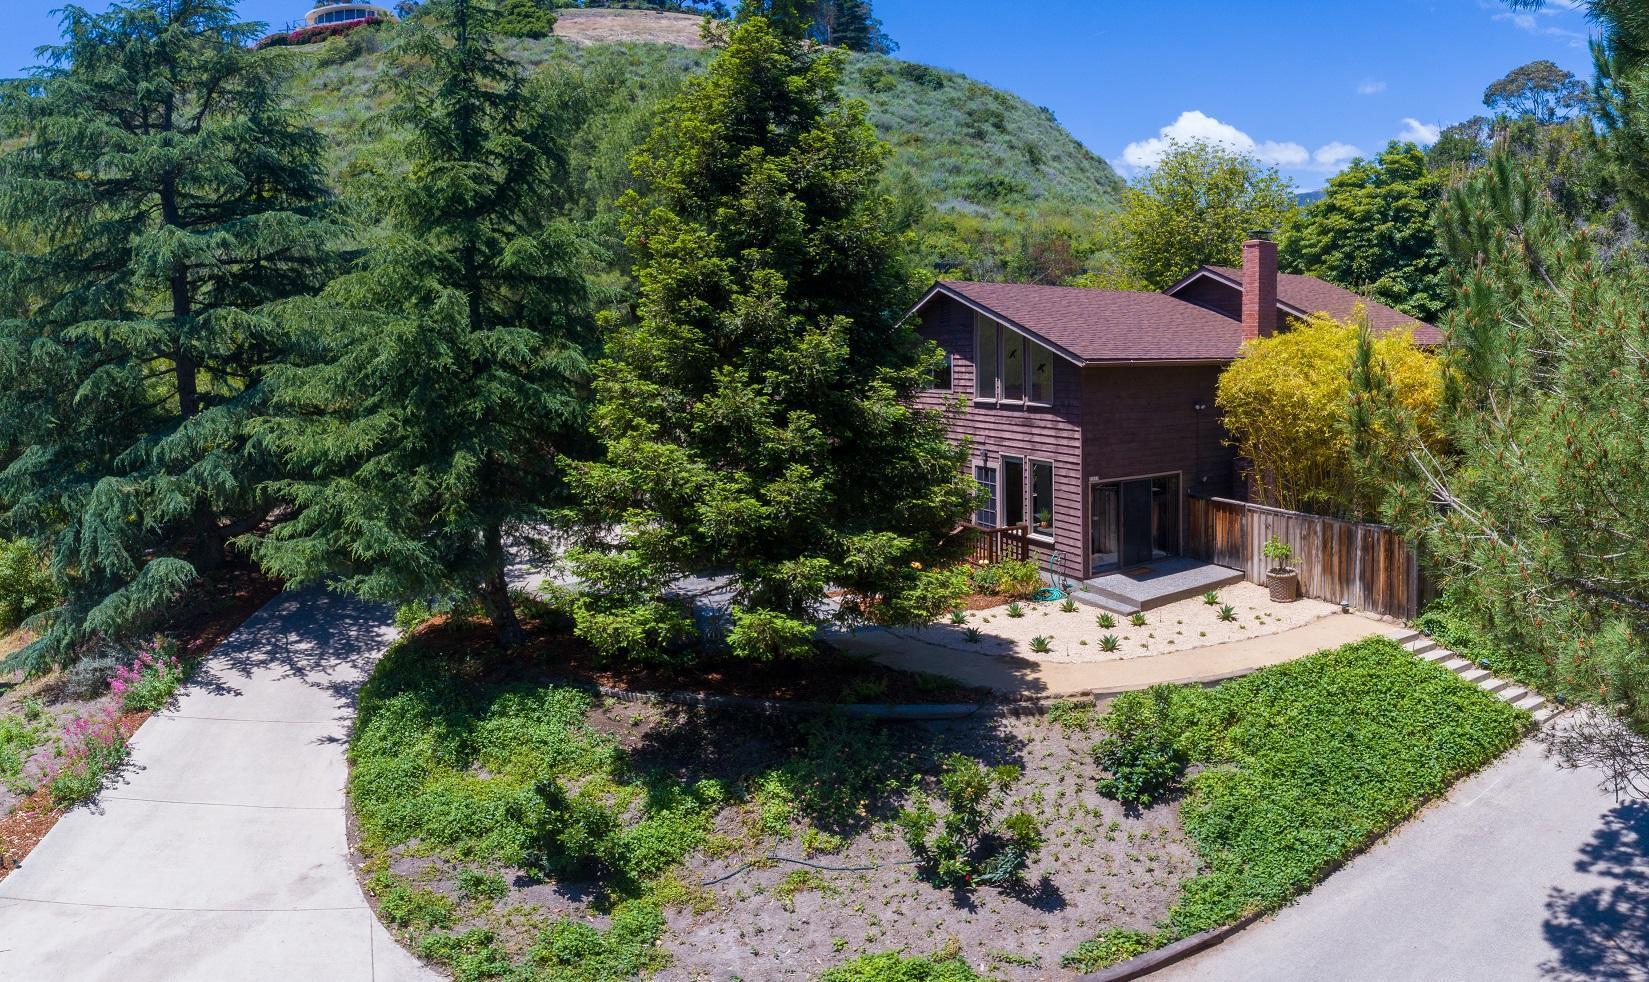 1431 Sycamore Canyon Rd